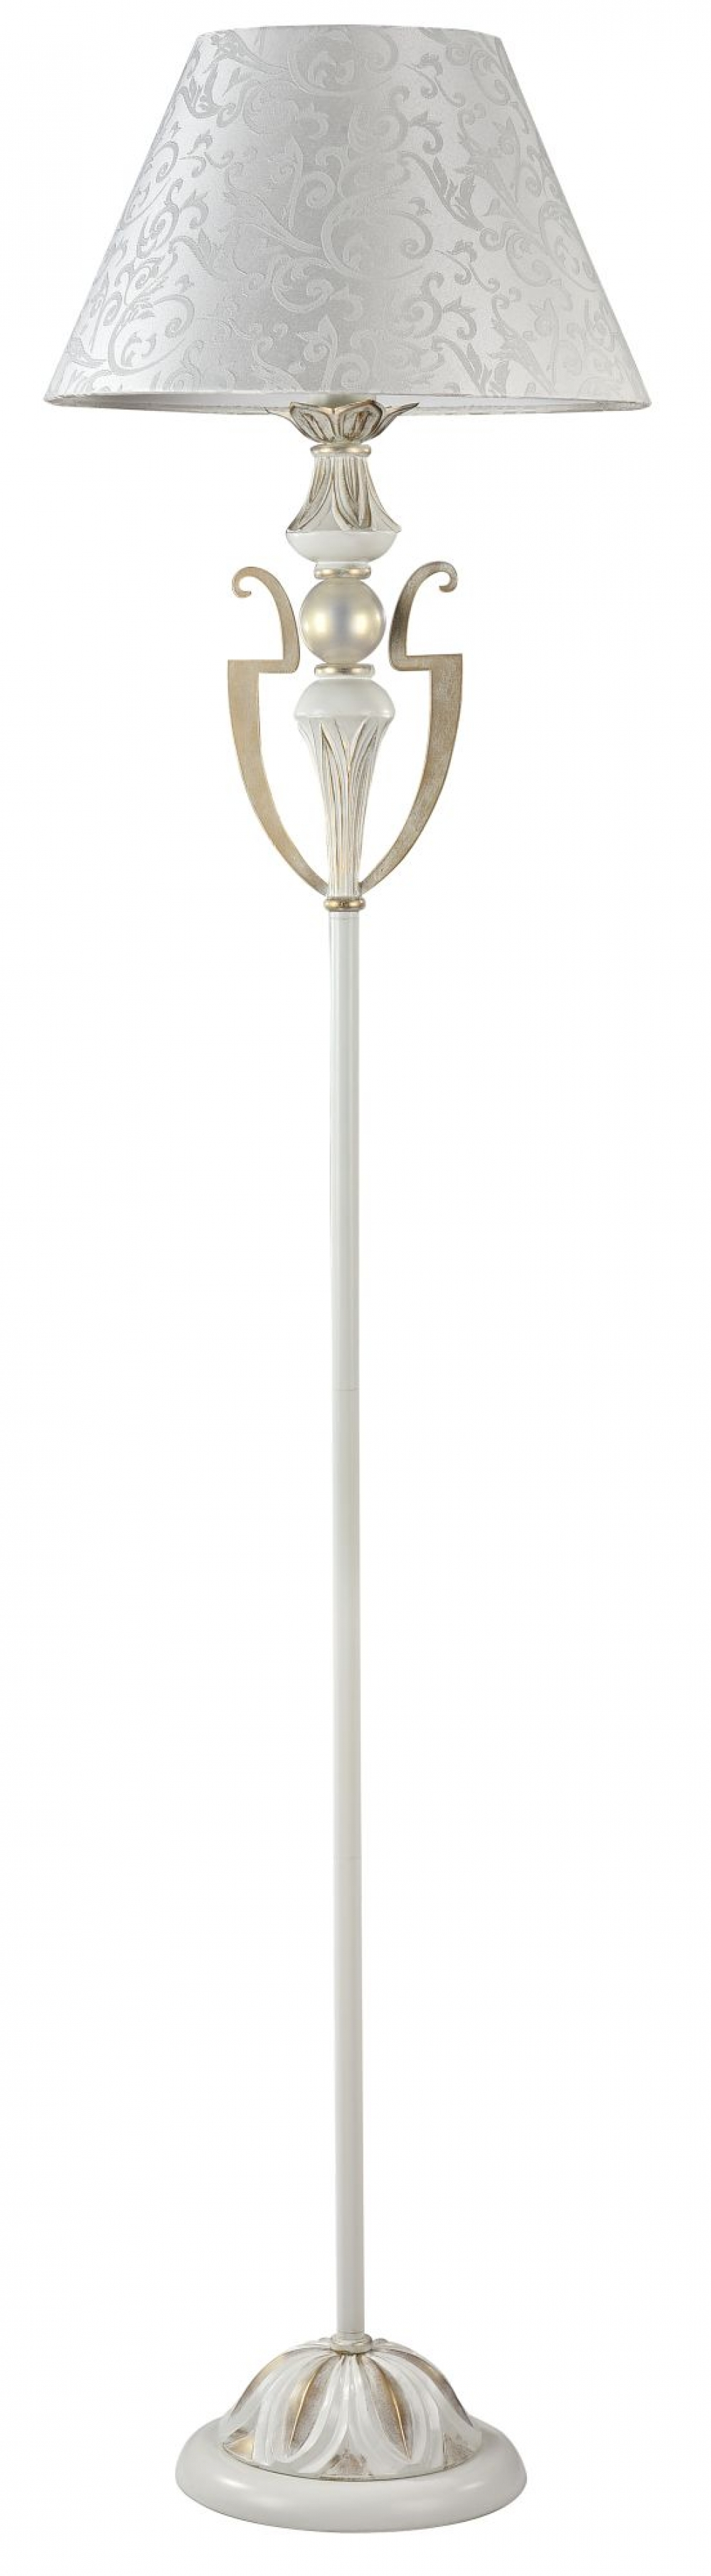 Lampa de podea Monile Alb/Auriu H1600mm imagine 2021 insignis.ro